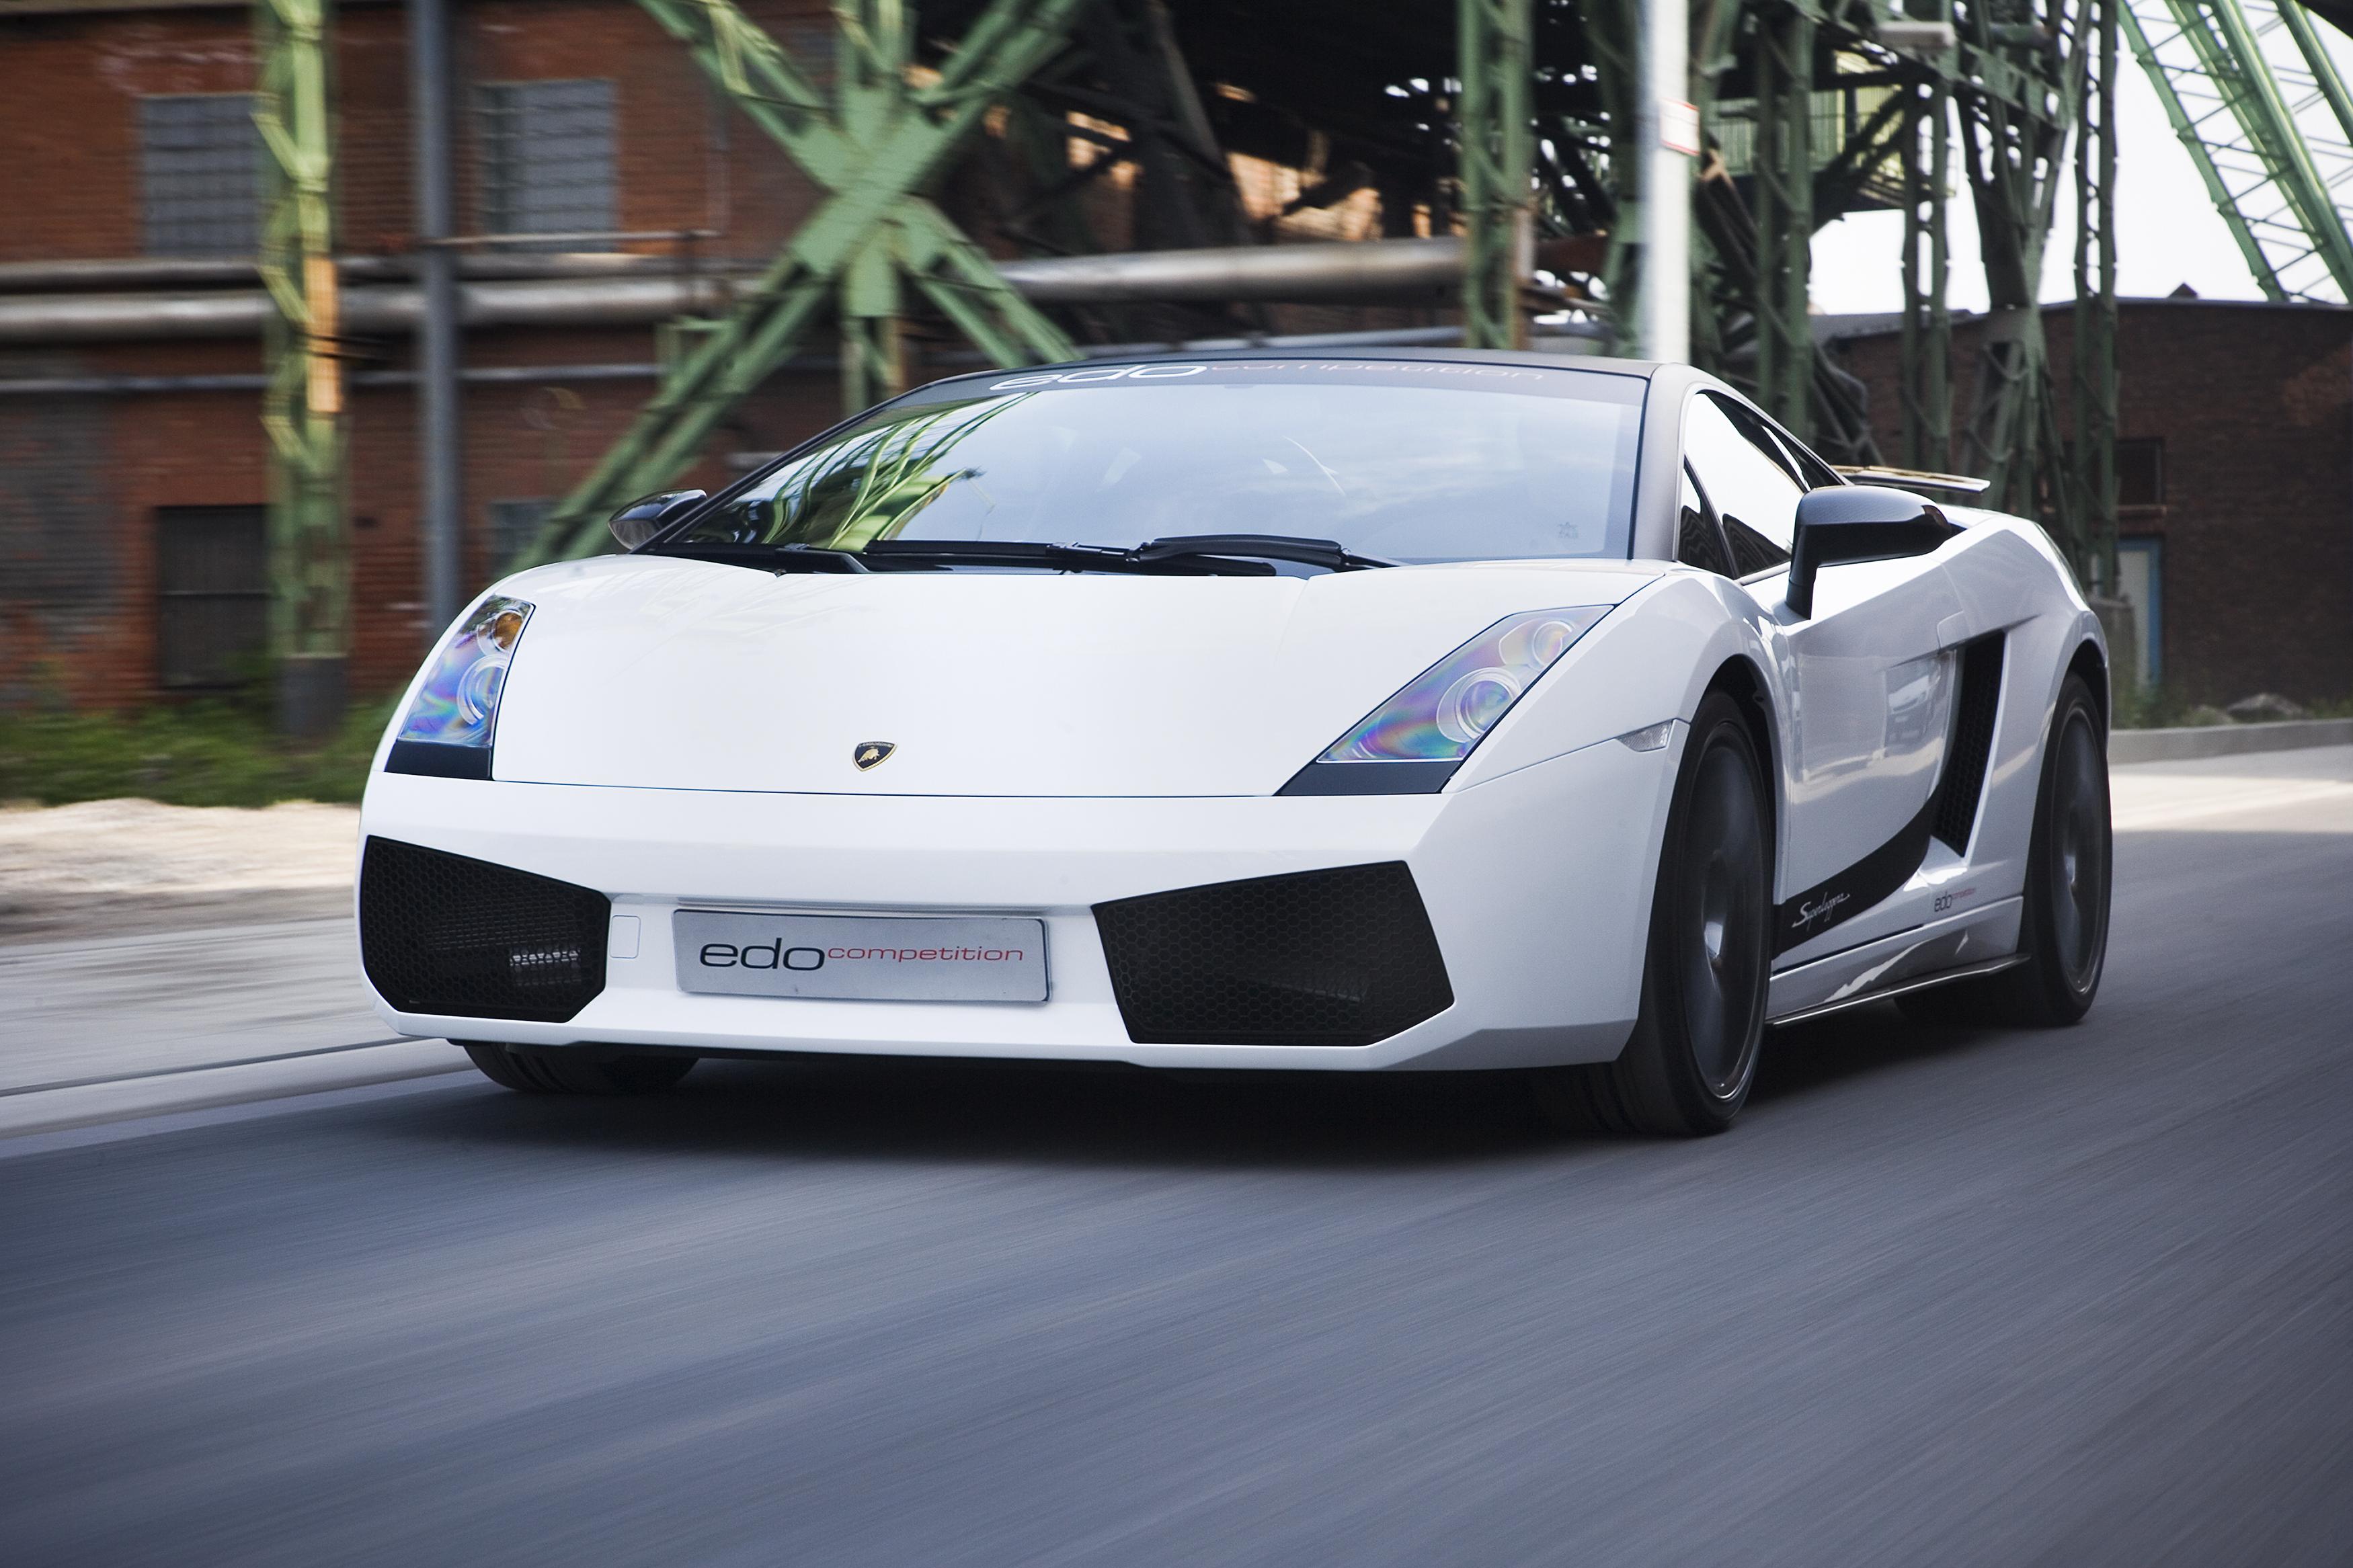 Lamborghini Gallardo Sle Edo Competition